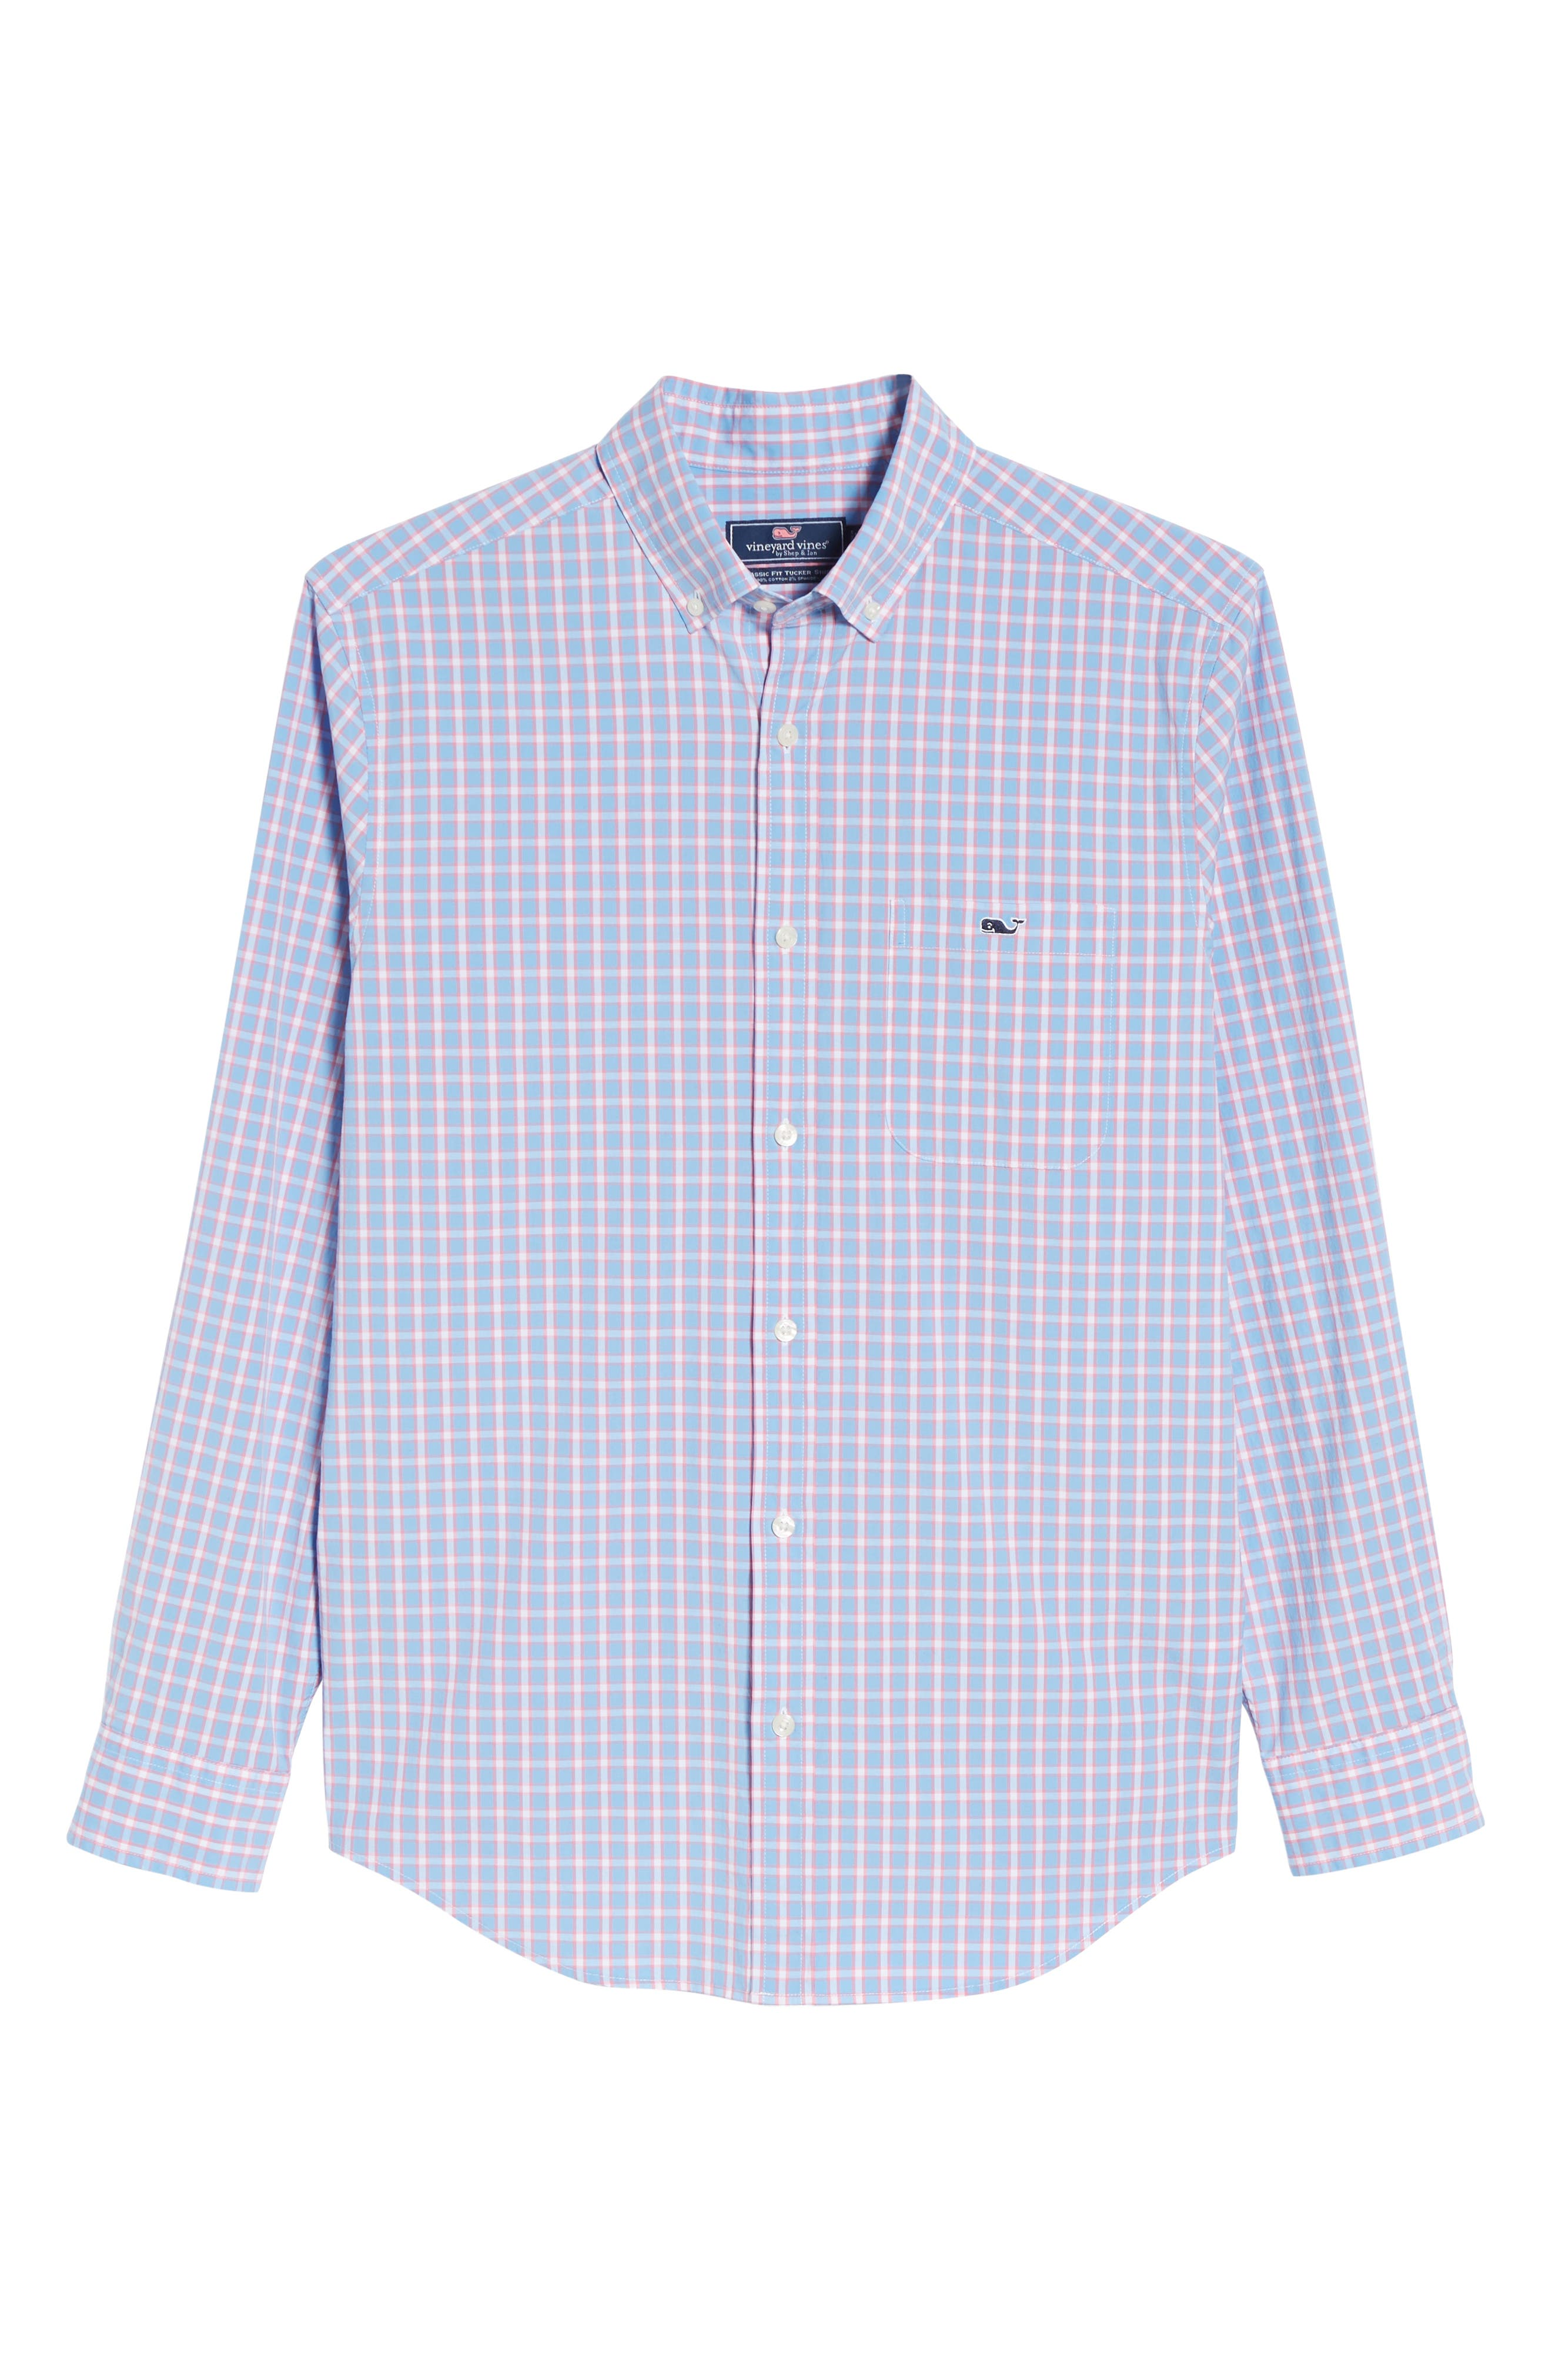 Harlock Pond Plaid Classic Fit Sport Shirt,                             Alternate thumbnail 6, color,                             OCEAN BREEZE